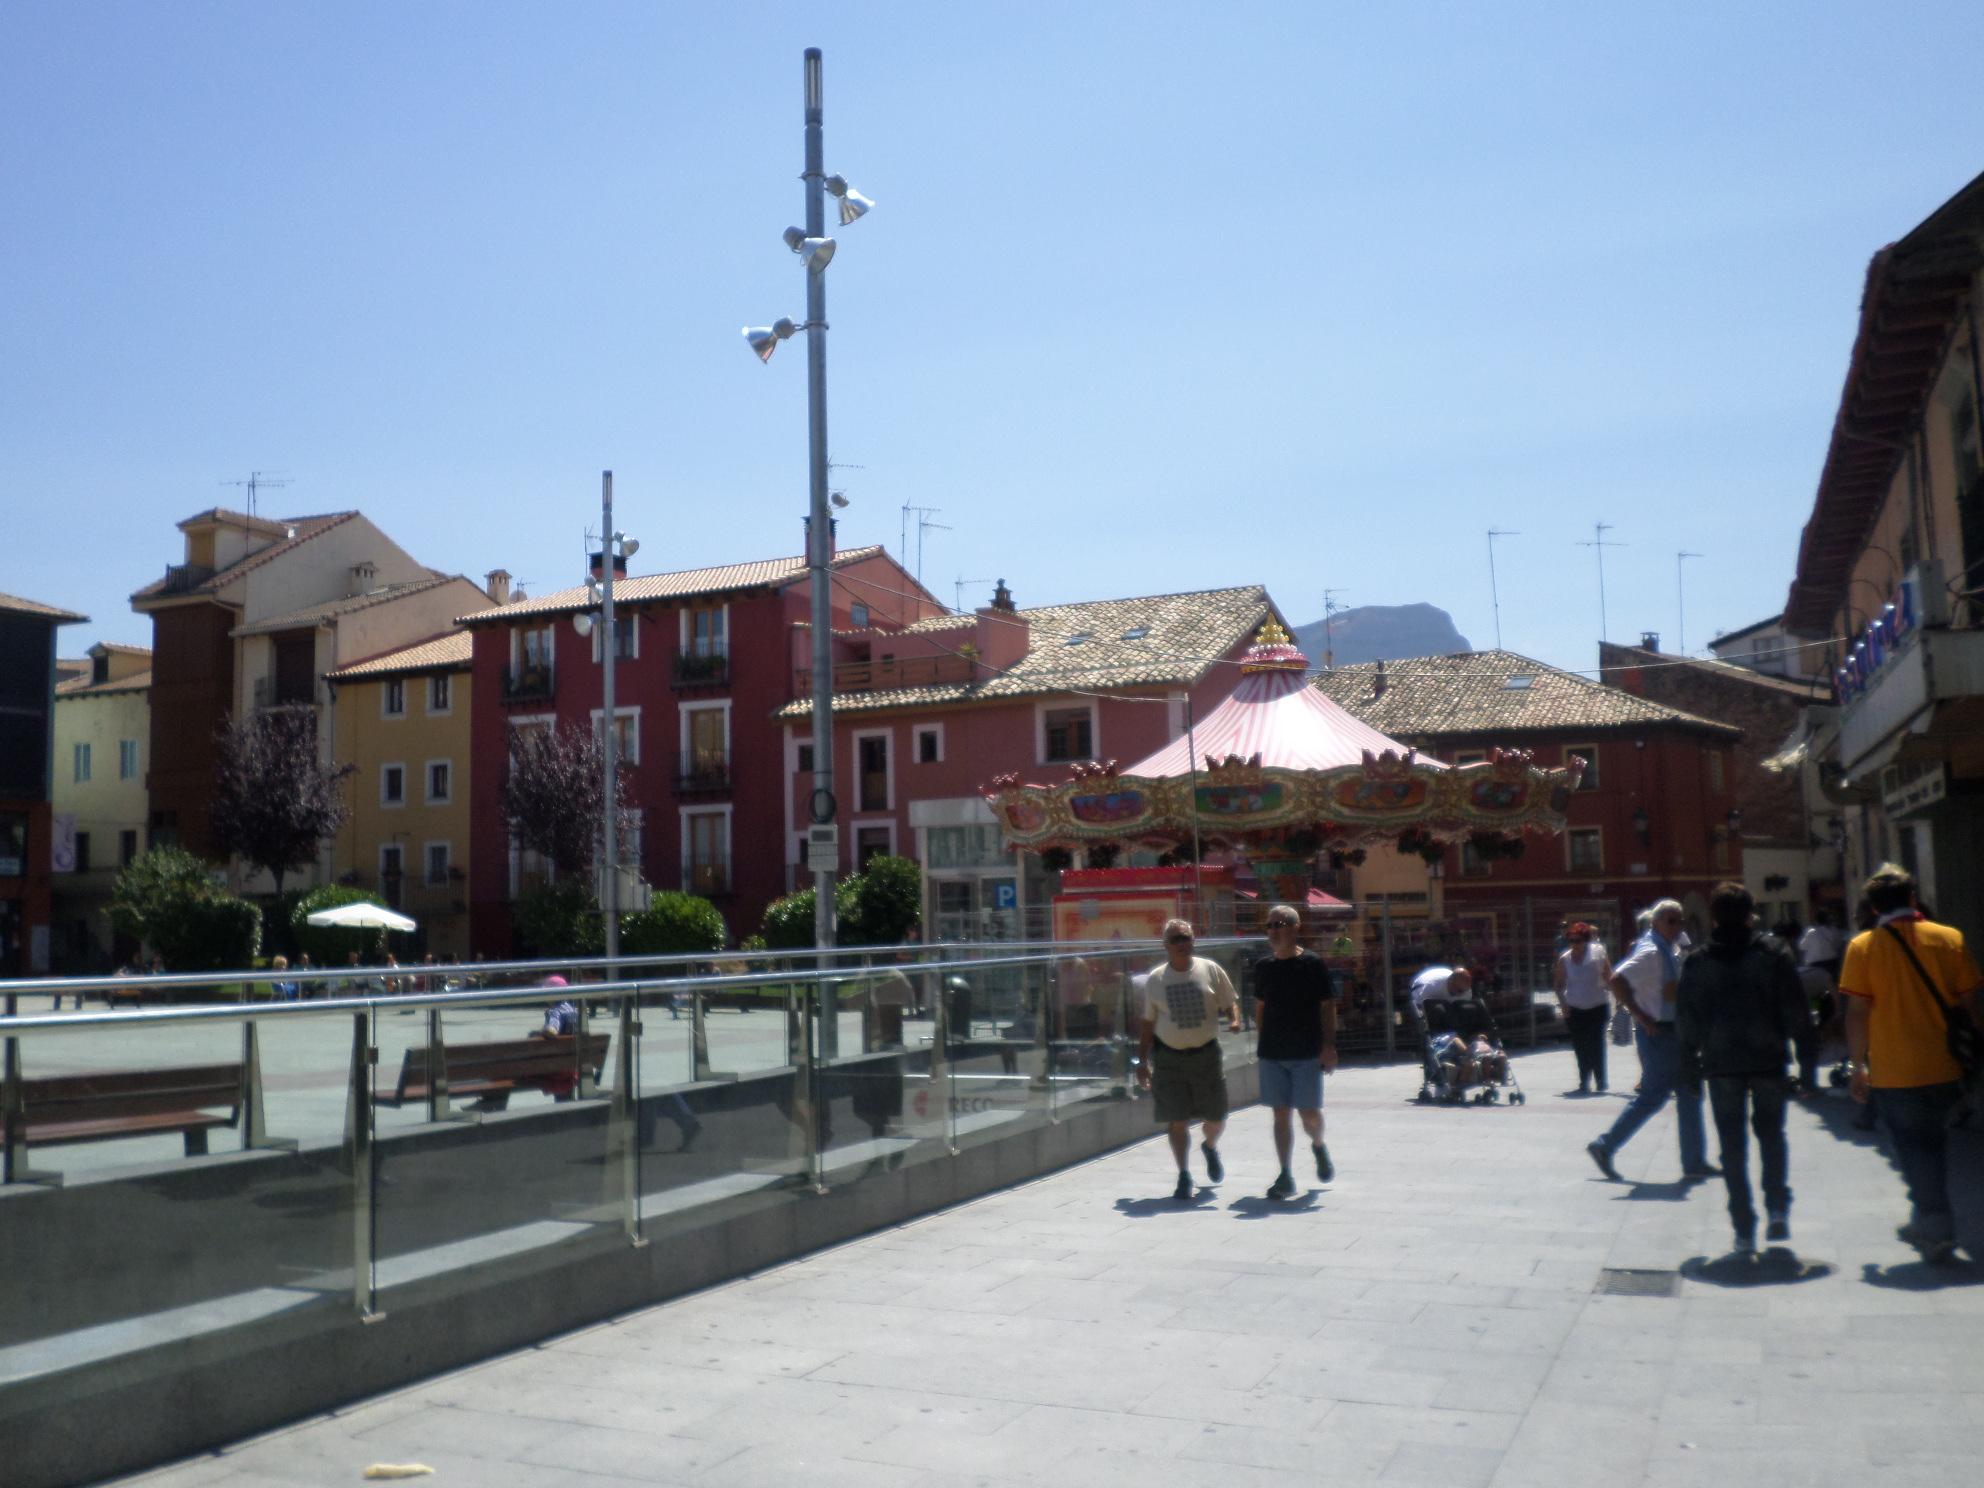 Jaca plaza ripa aug14